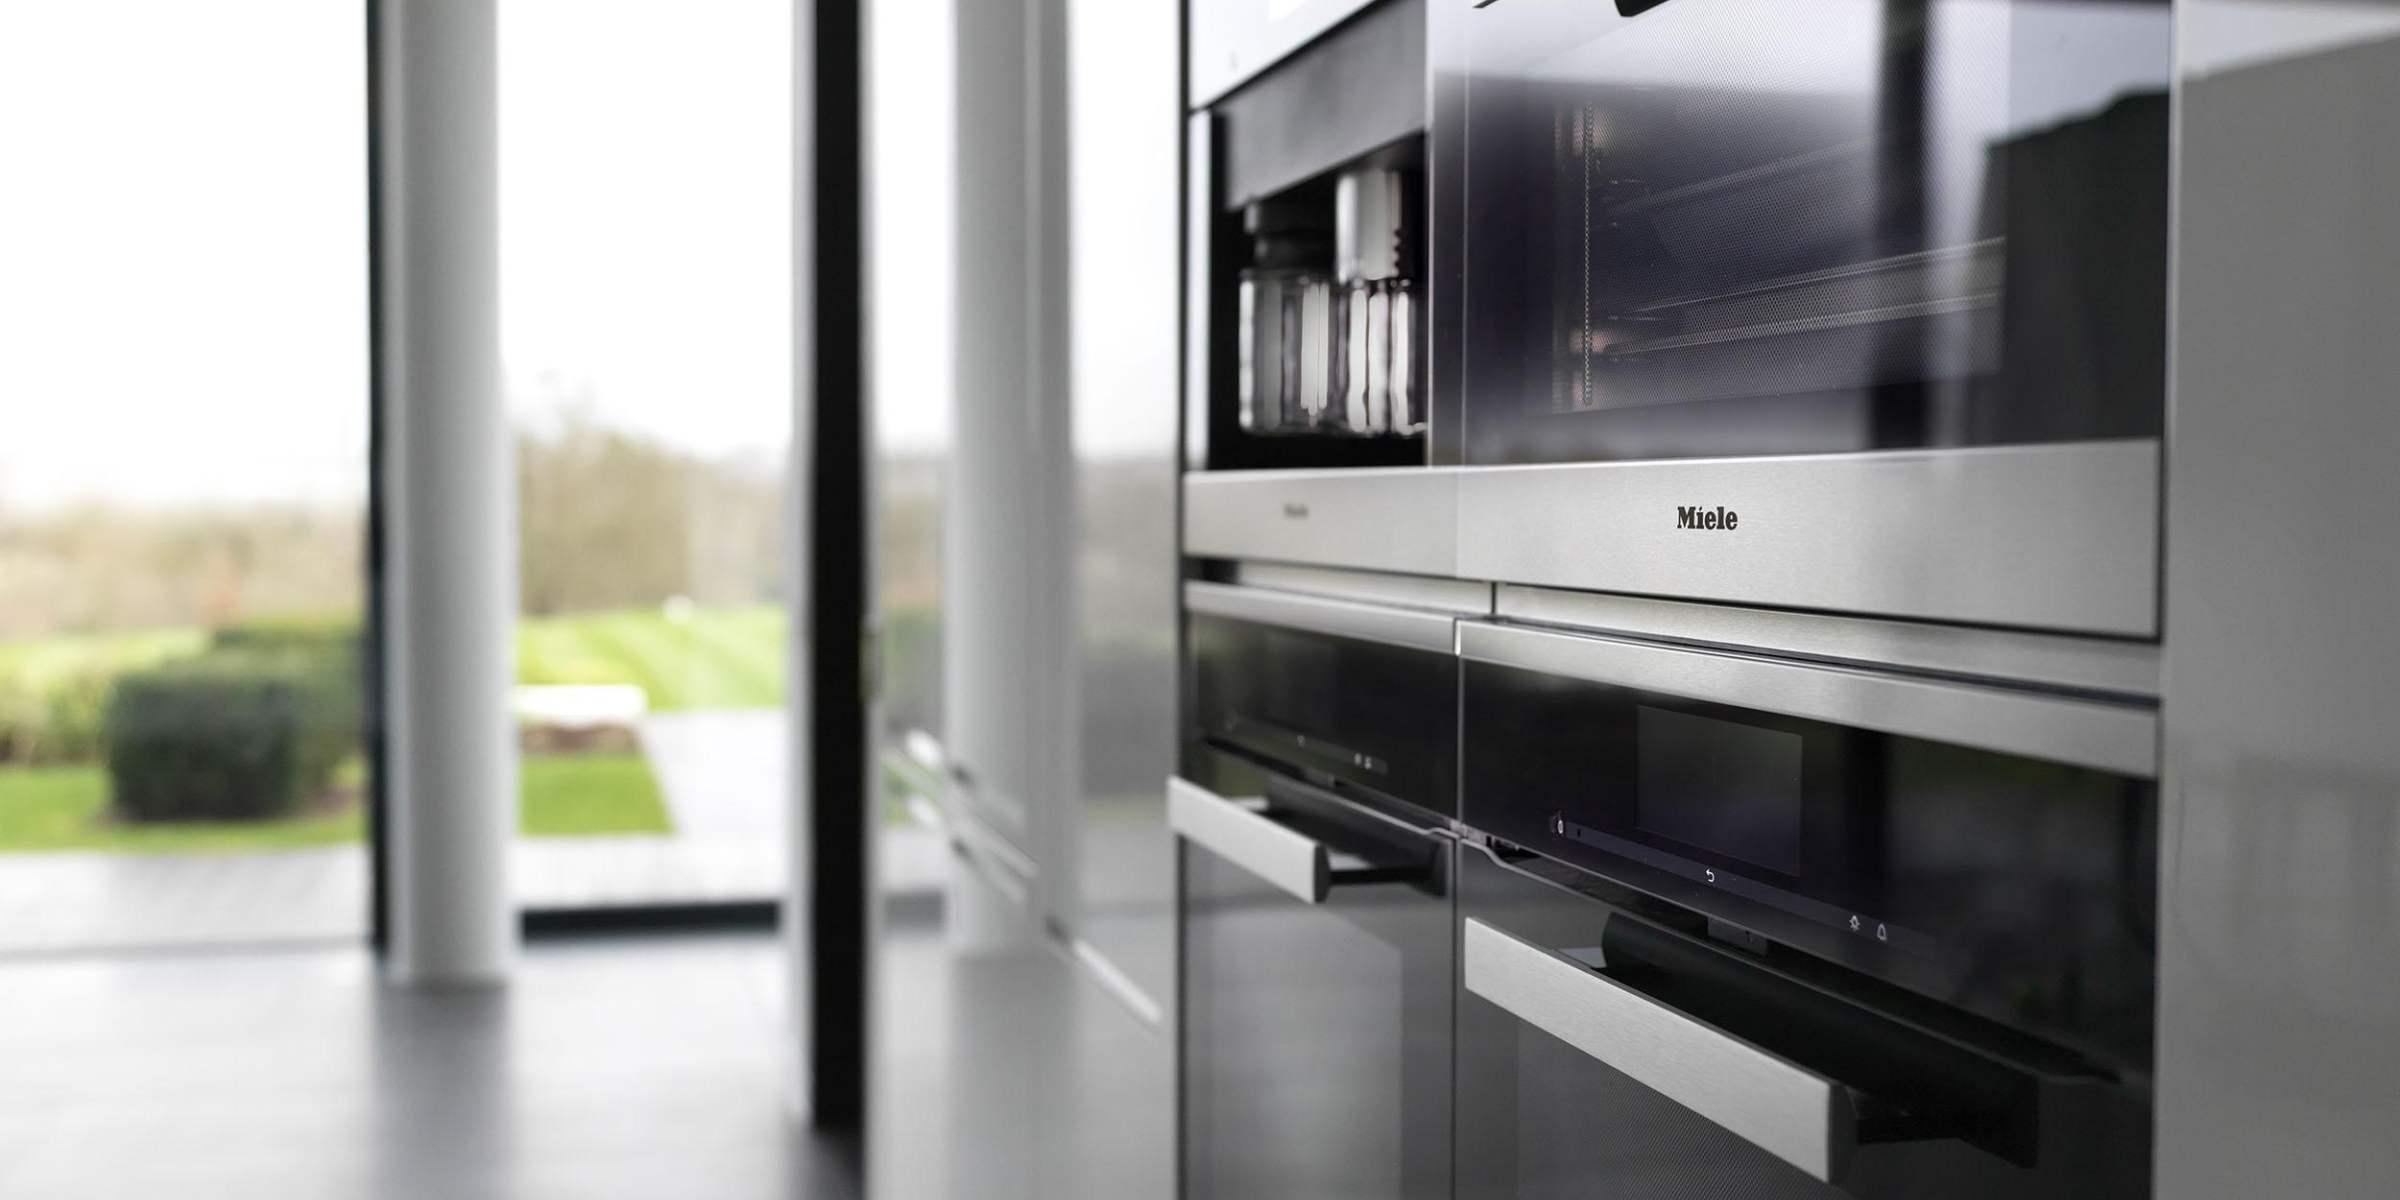 Miele Kitchen Appliances COD Kitchen Appliances